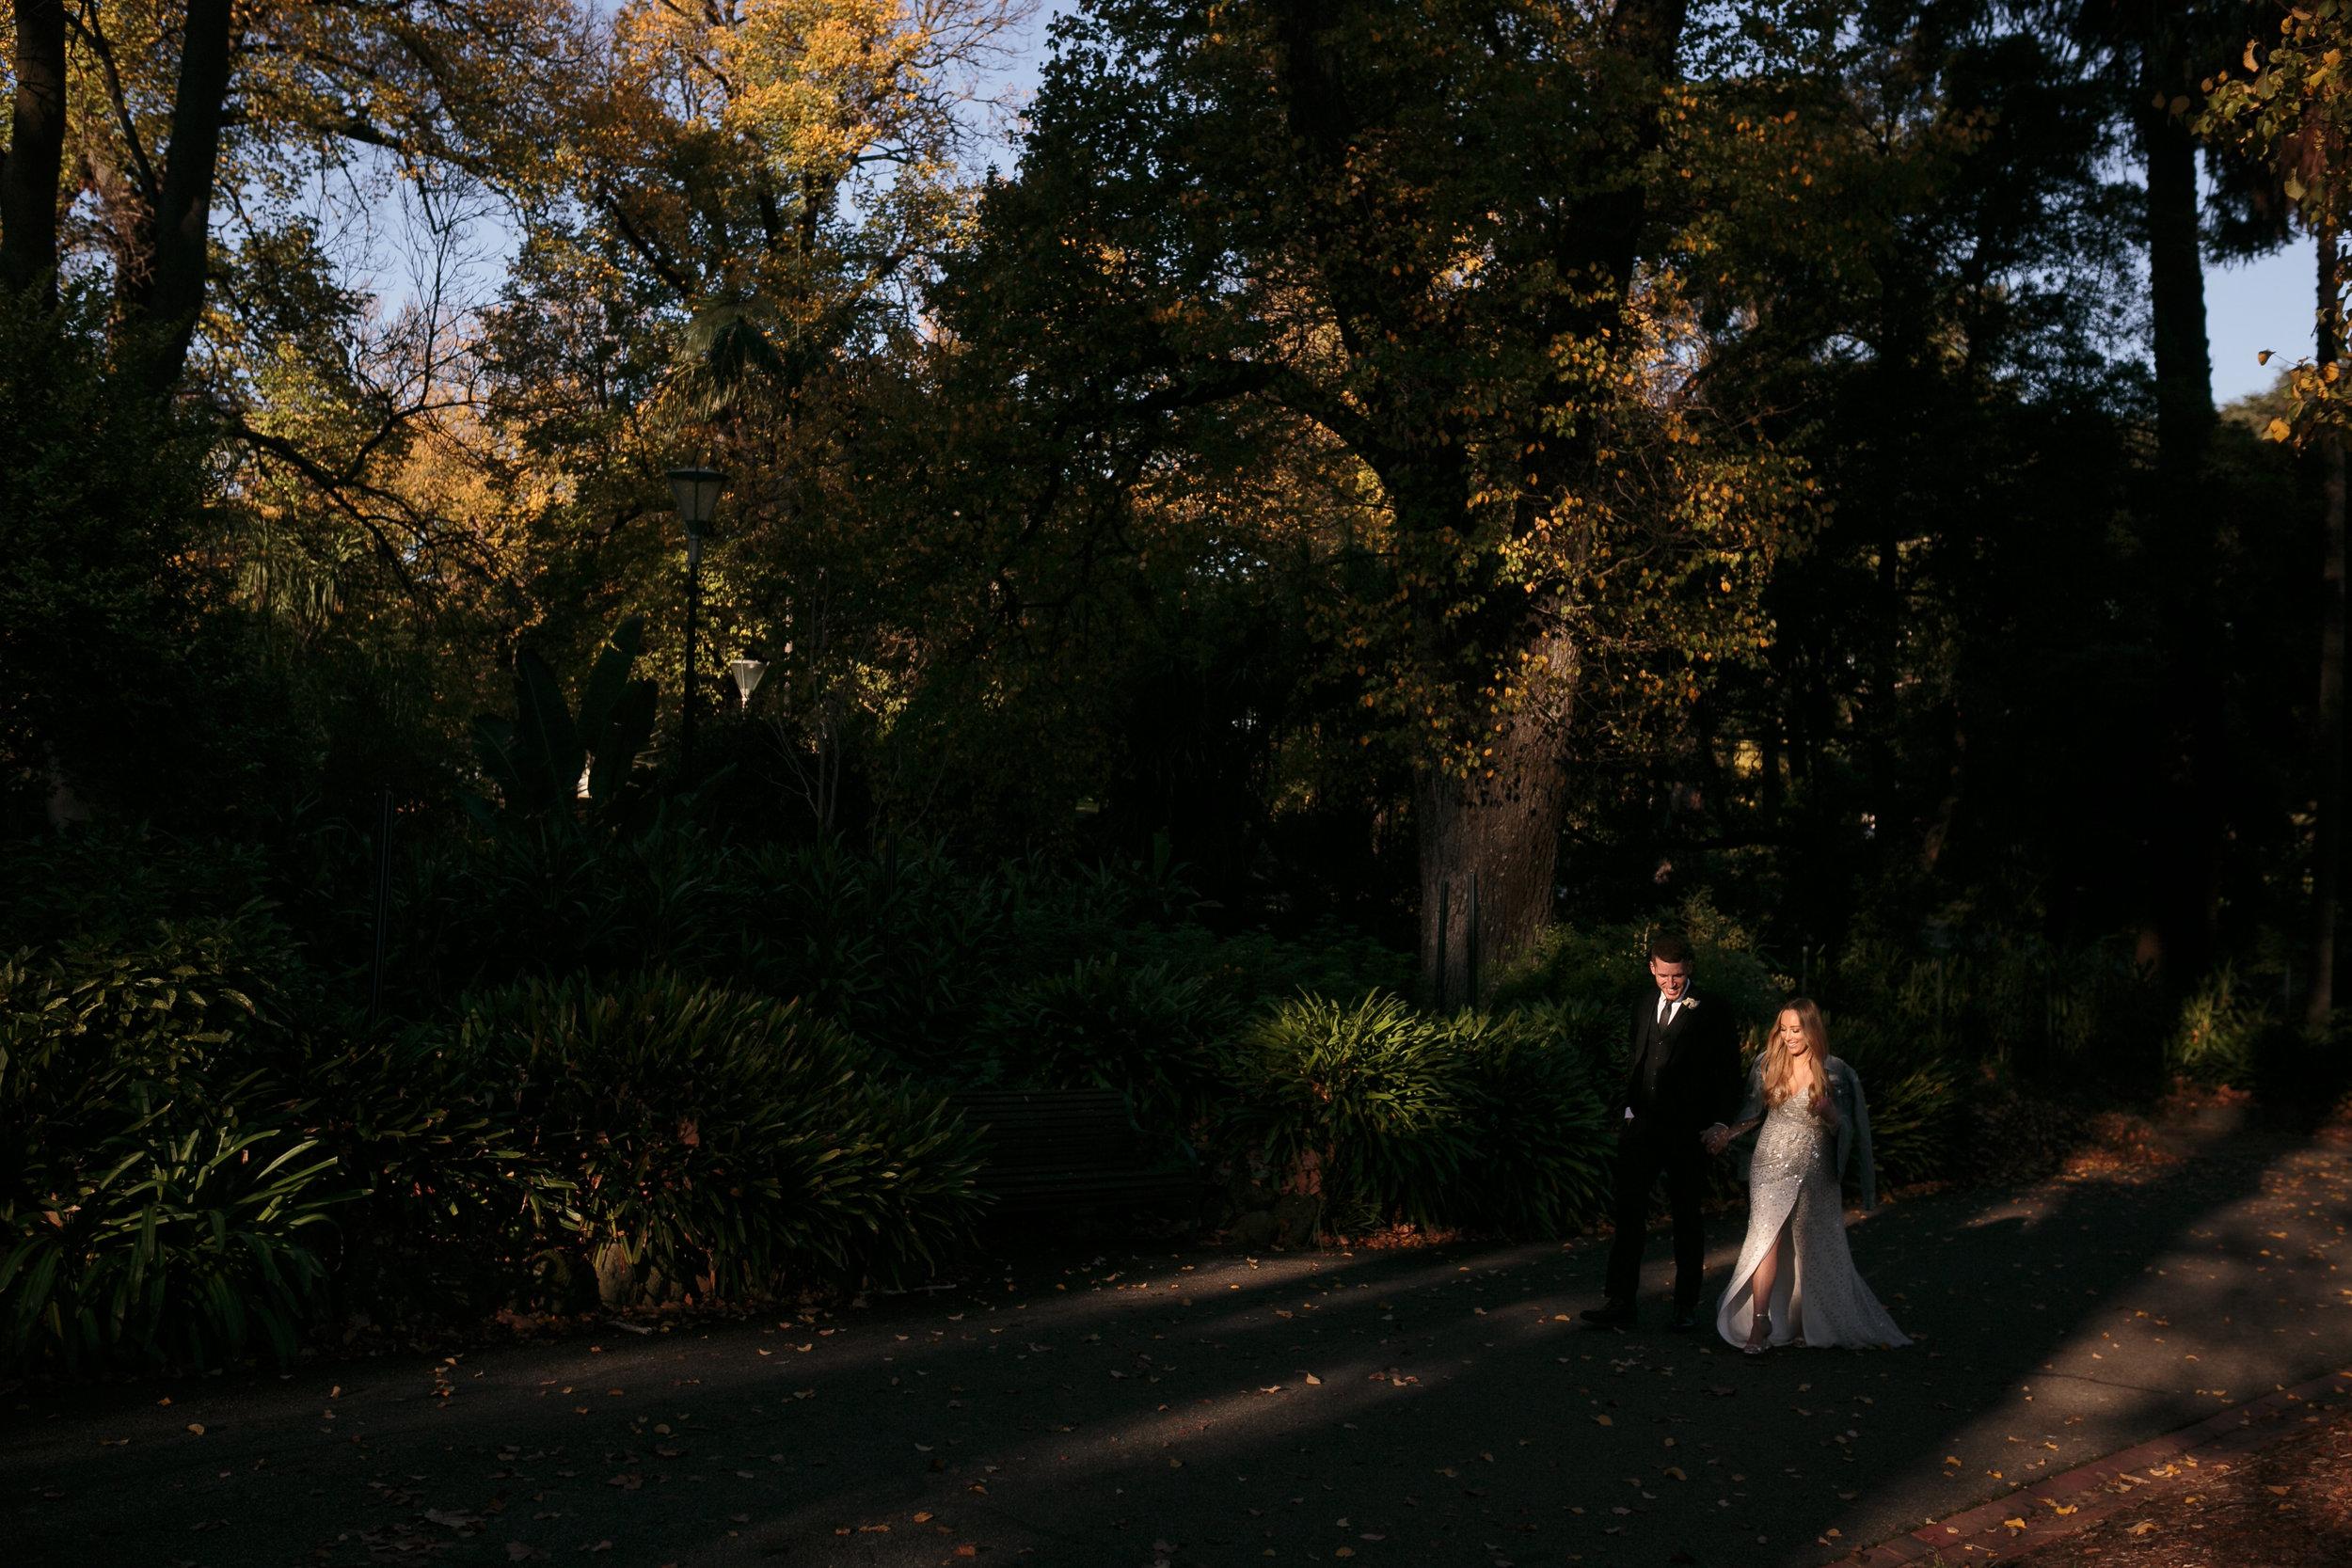 JEREMY-BLODE-Liza + James Wedding Highlights-49.jpg